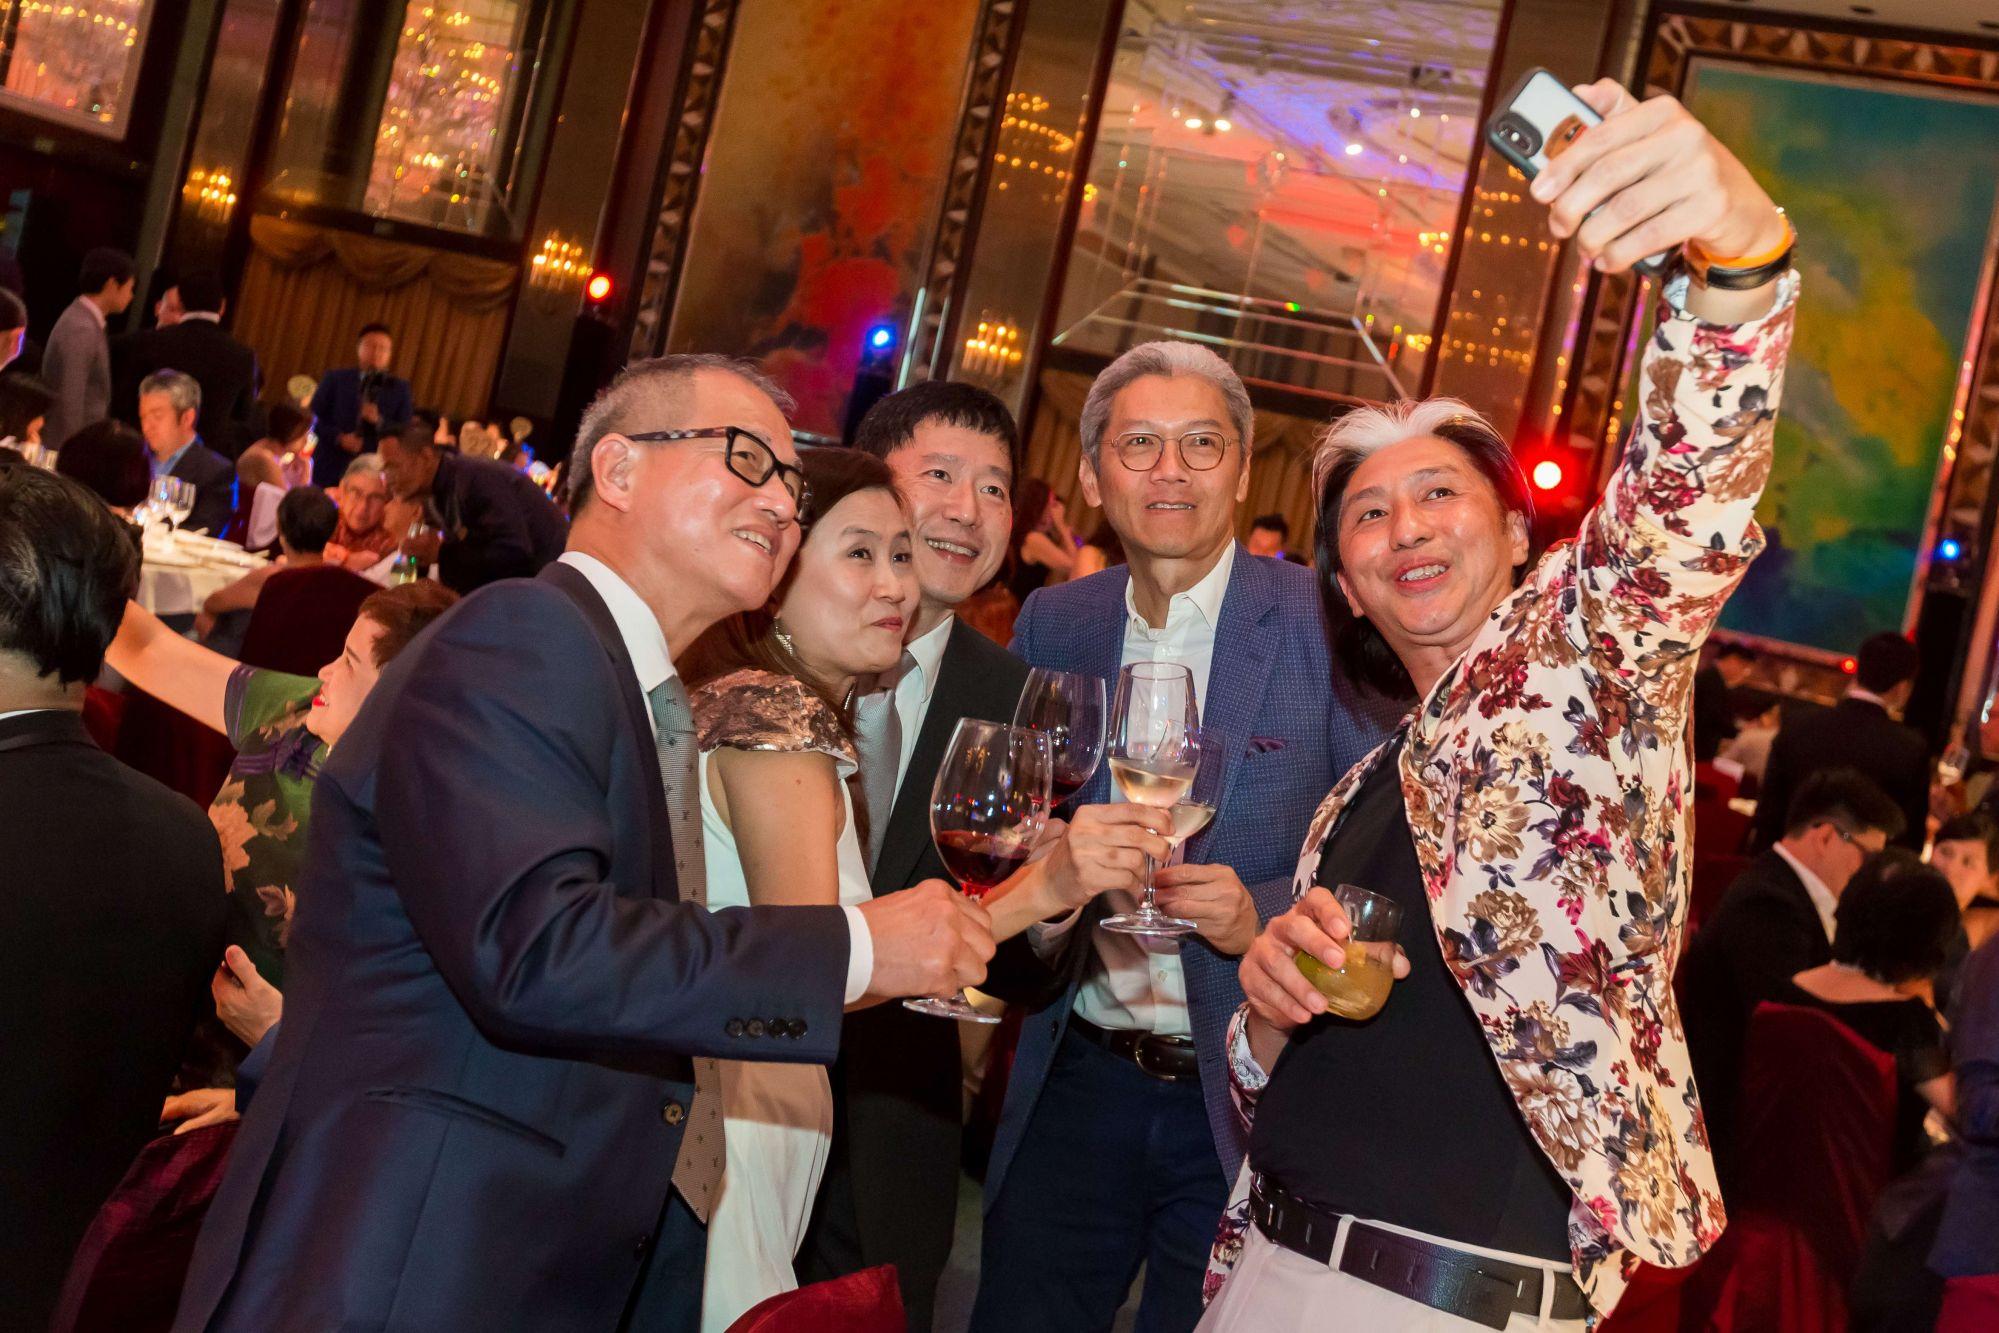 Rod Lim, Marianna Chong, Daniel Ong, Lee Sze Leong, Dominic Seow